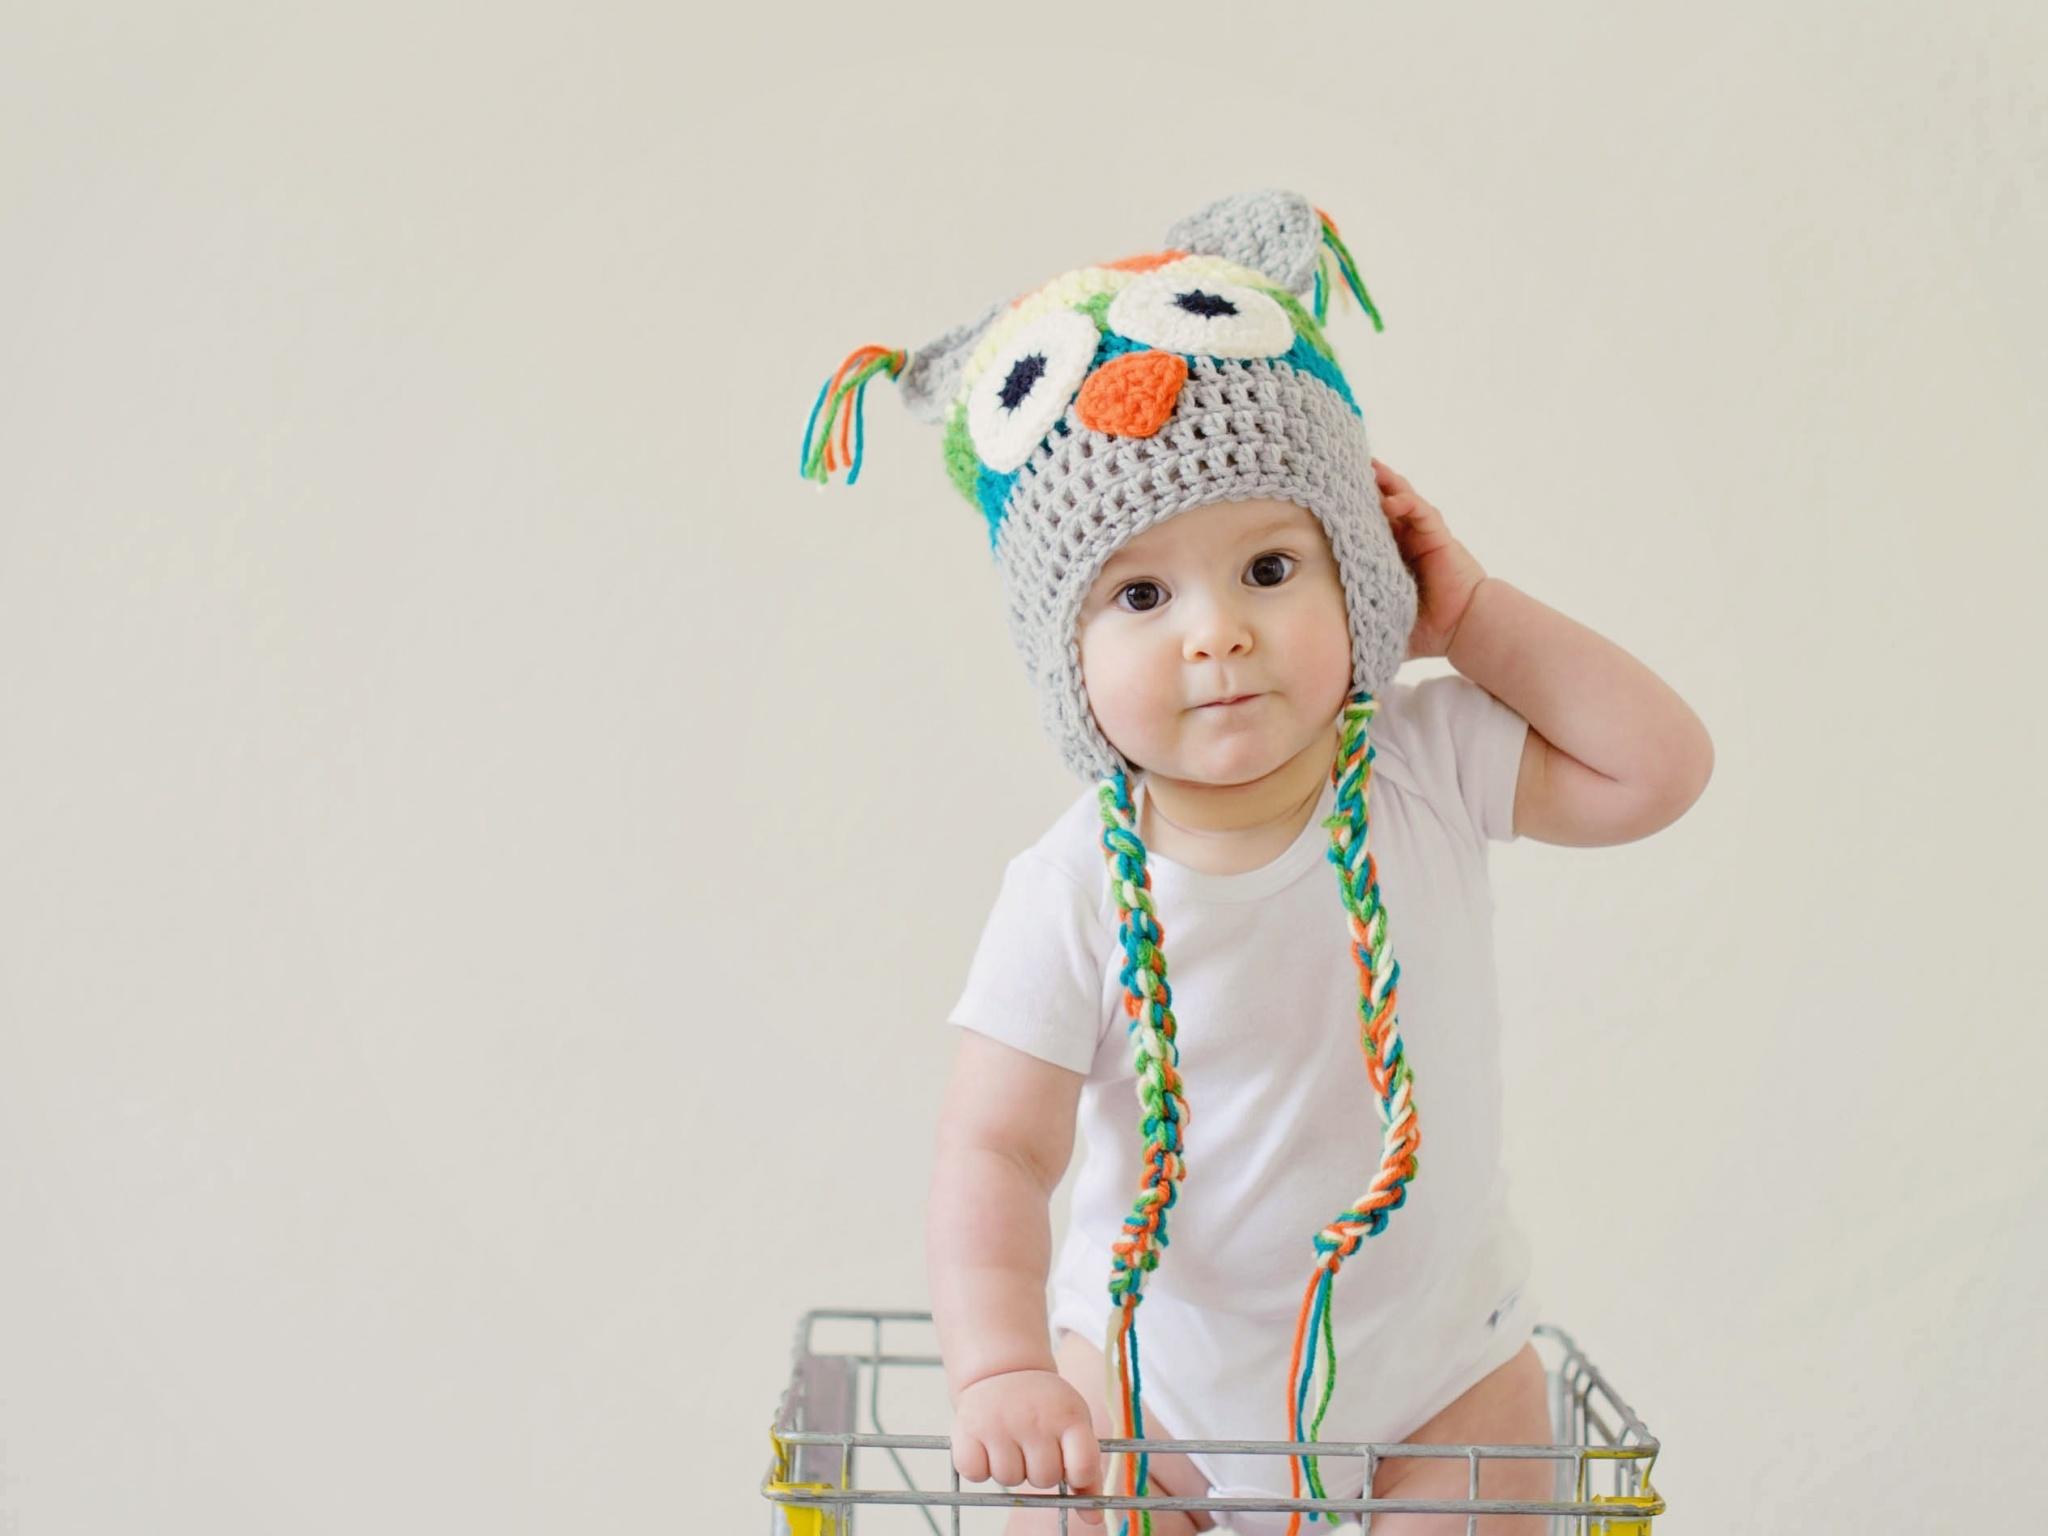 Cute Boy 4k Wallpaper Toddler Cute Kid Adorable Crochet Hat Basket Cute 1172